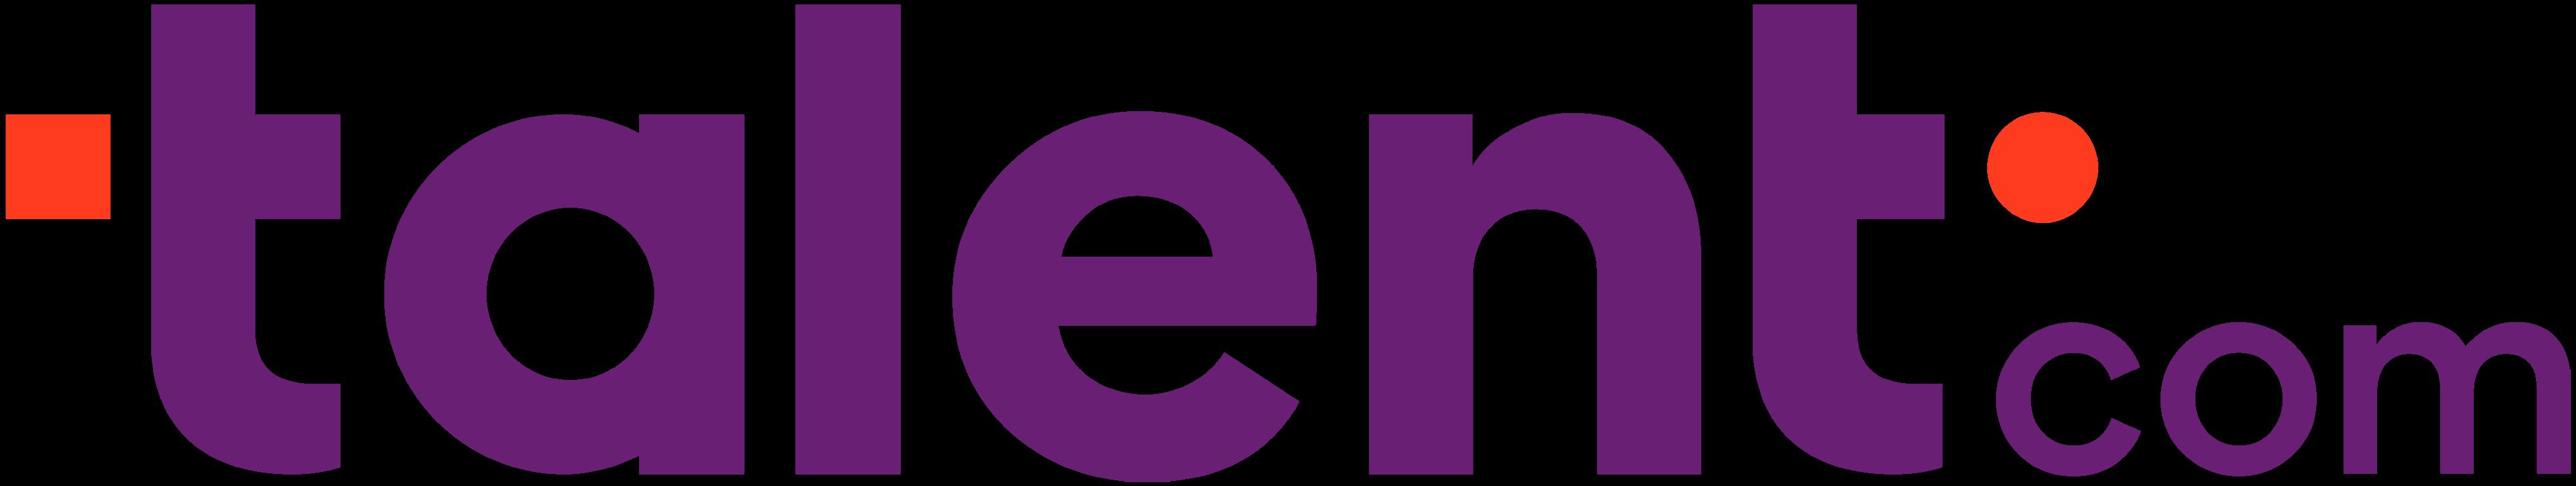 1. Official Logo no margins